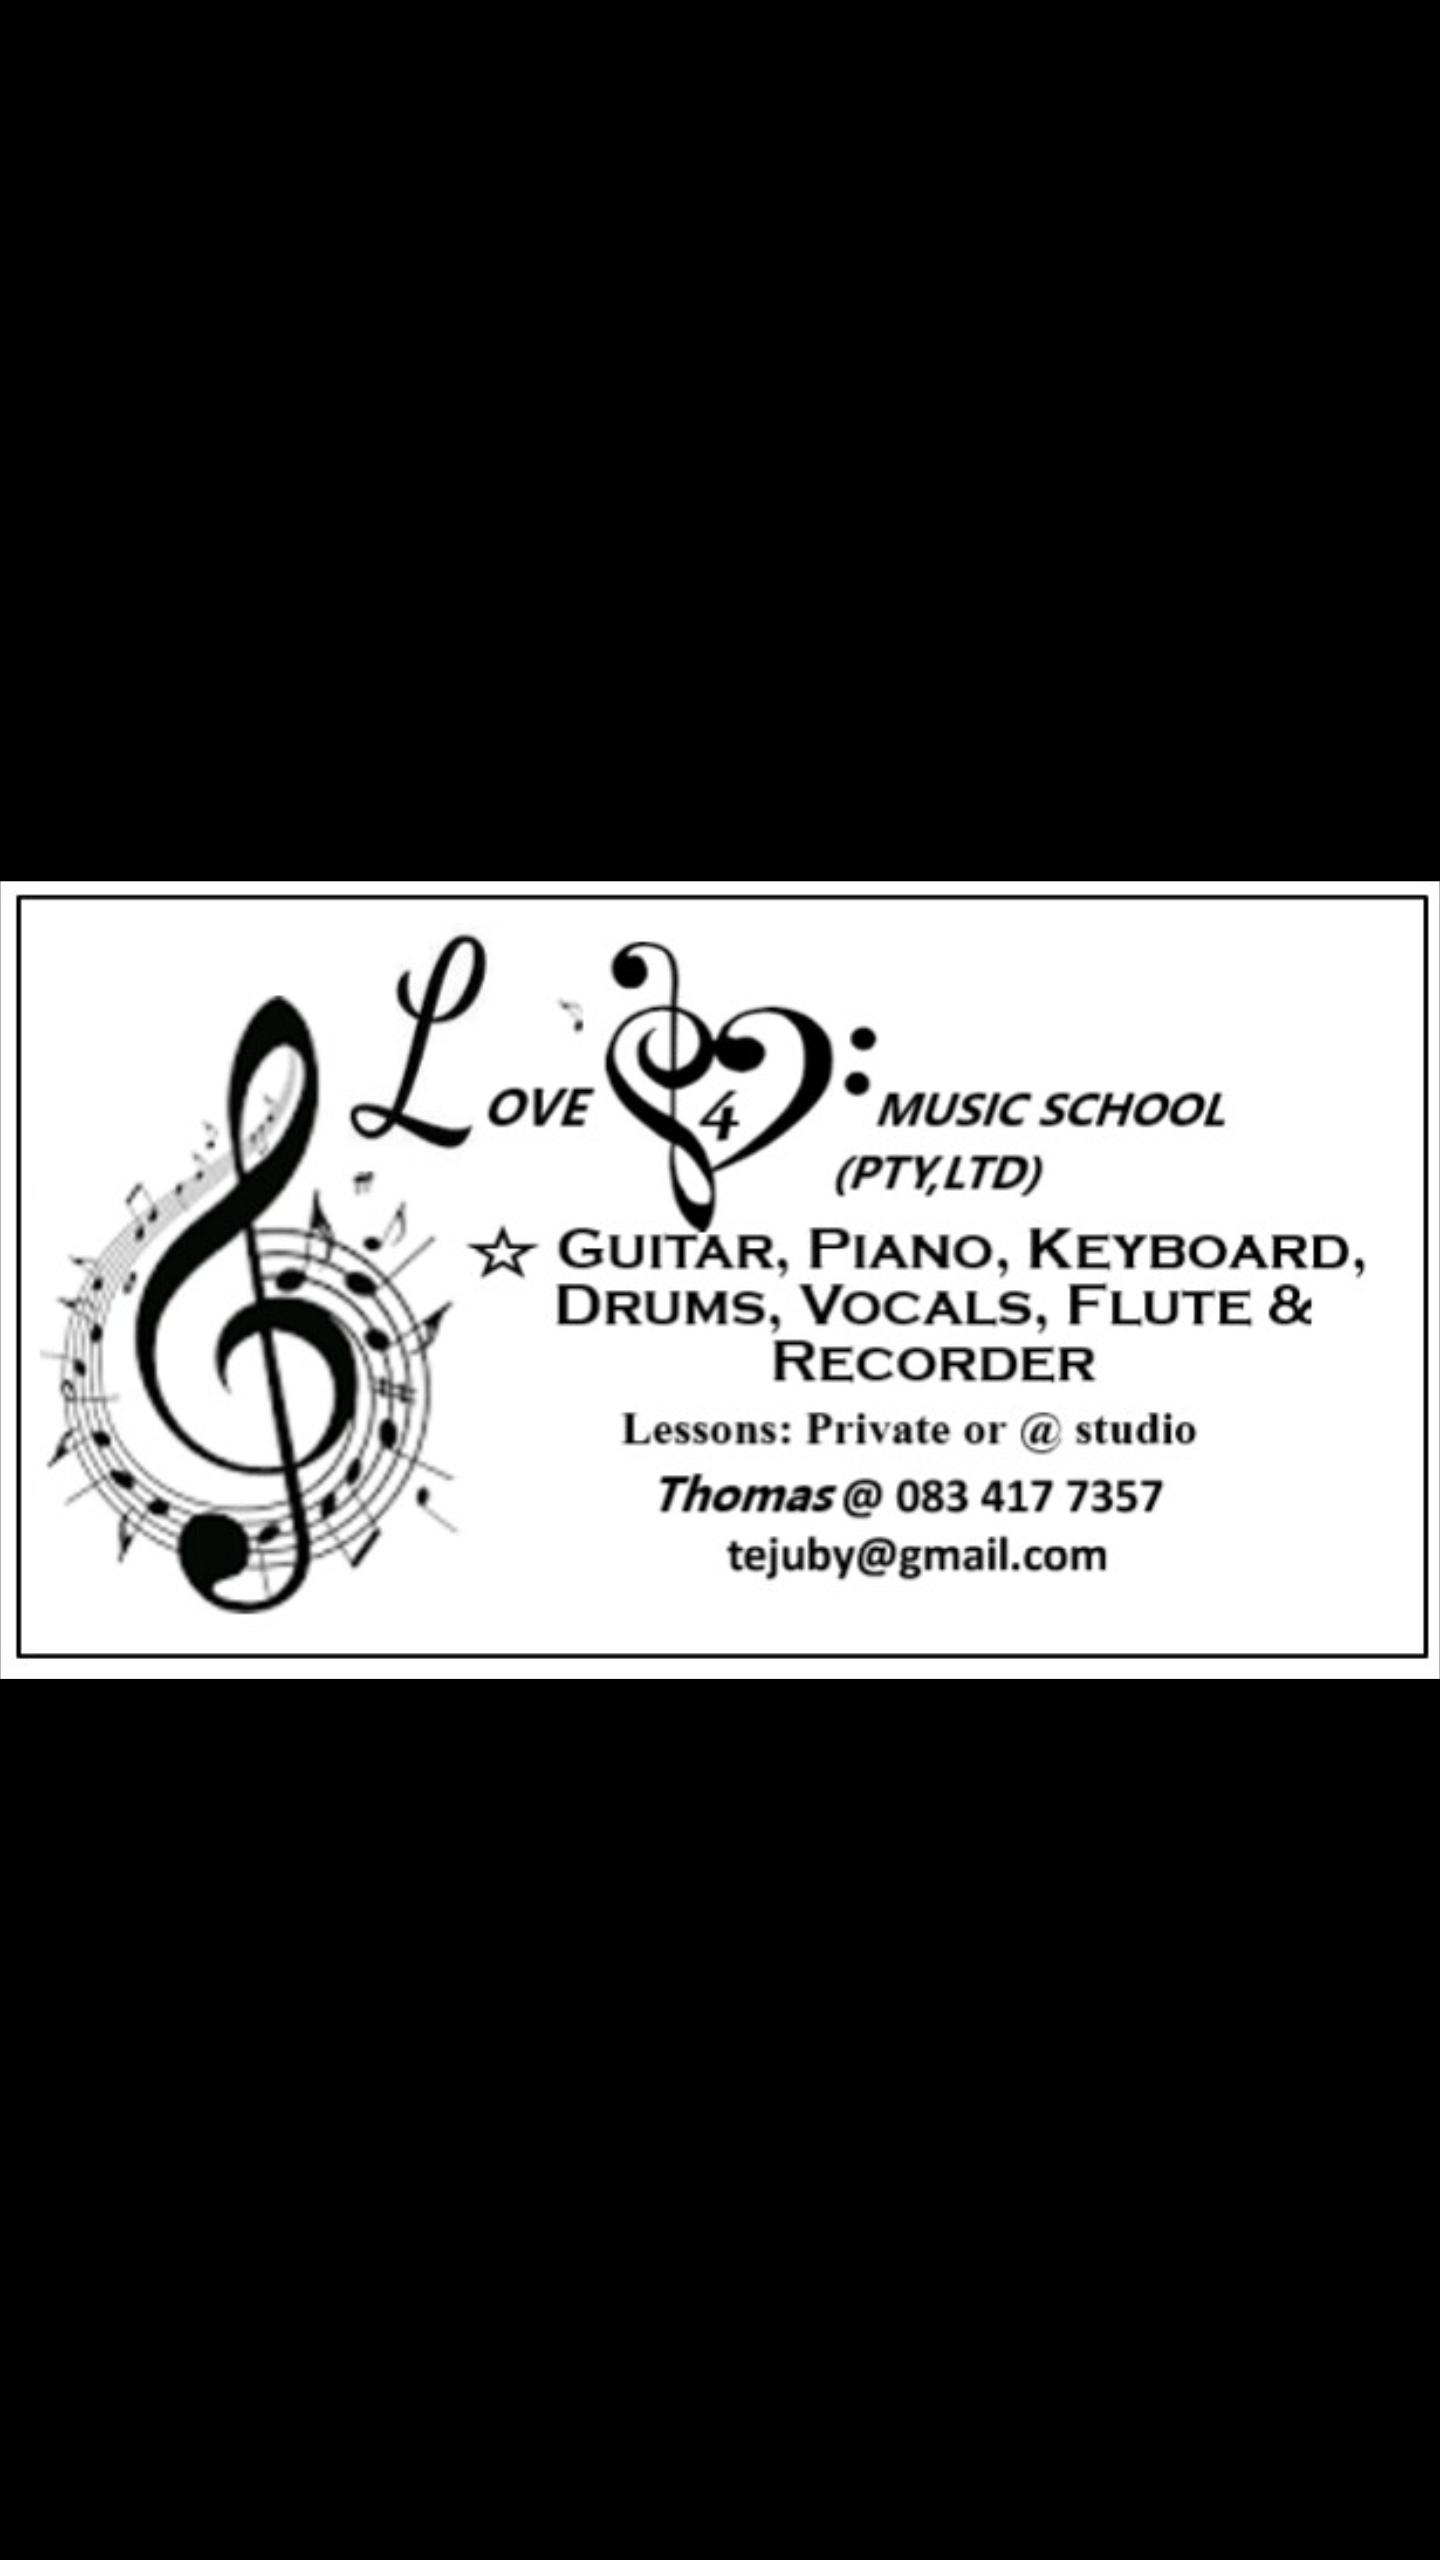 Love4Music school(Pty Ltd )